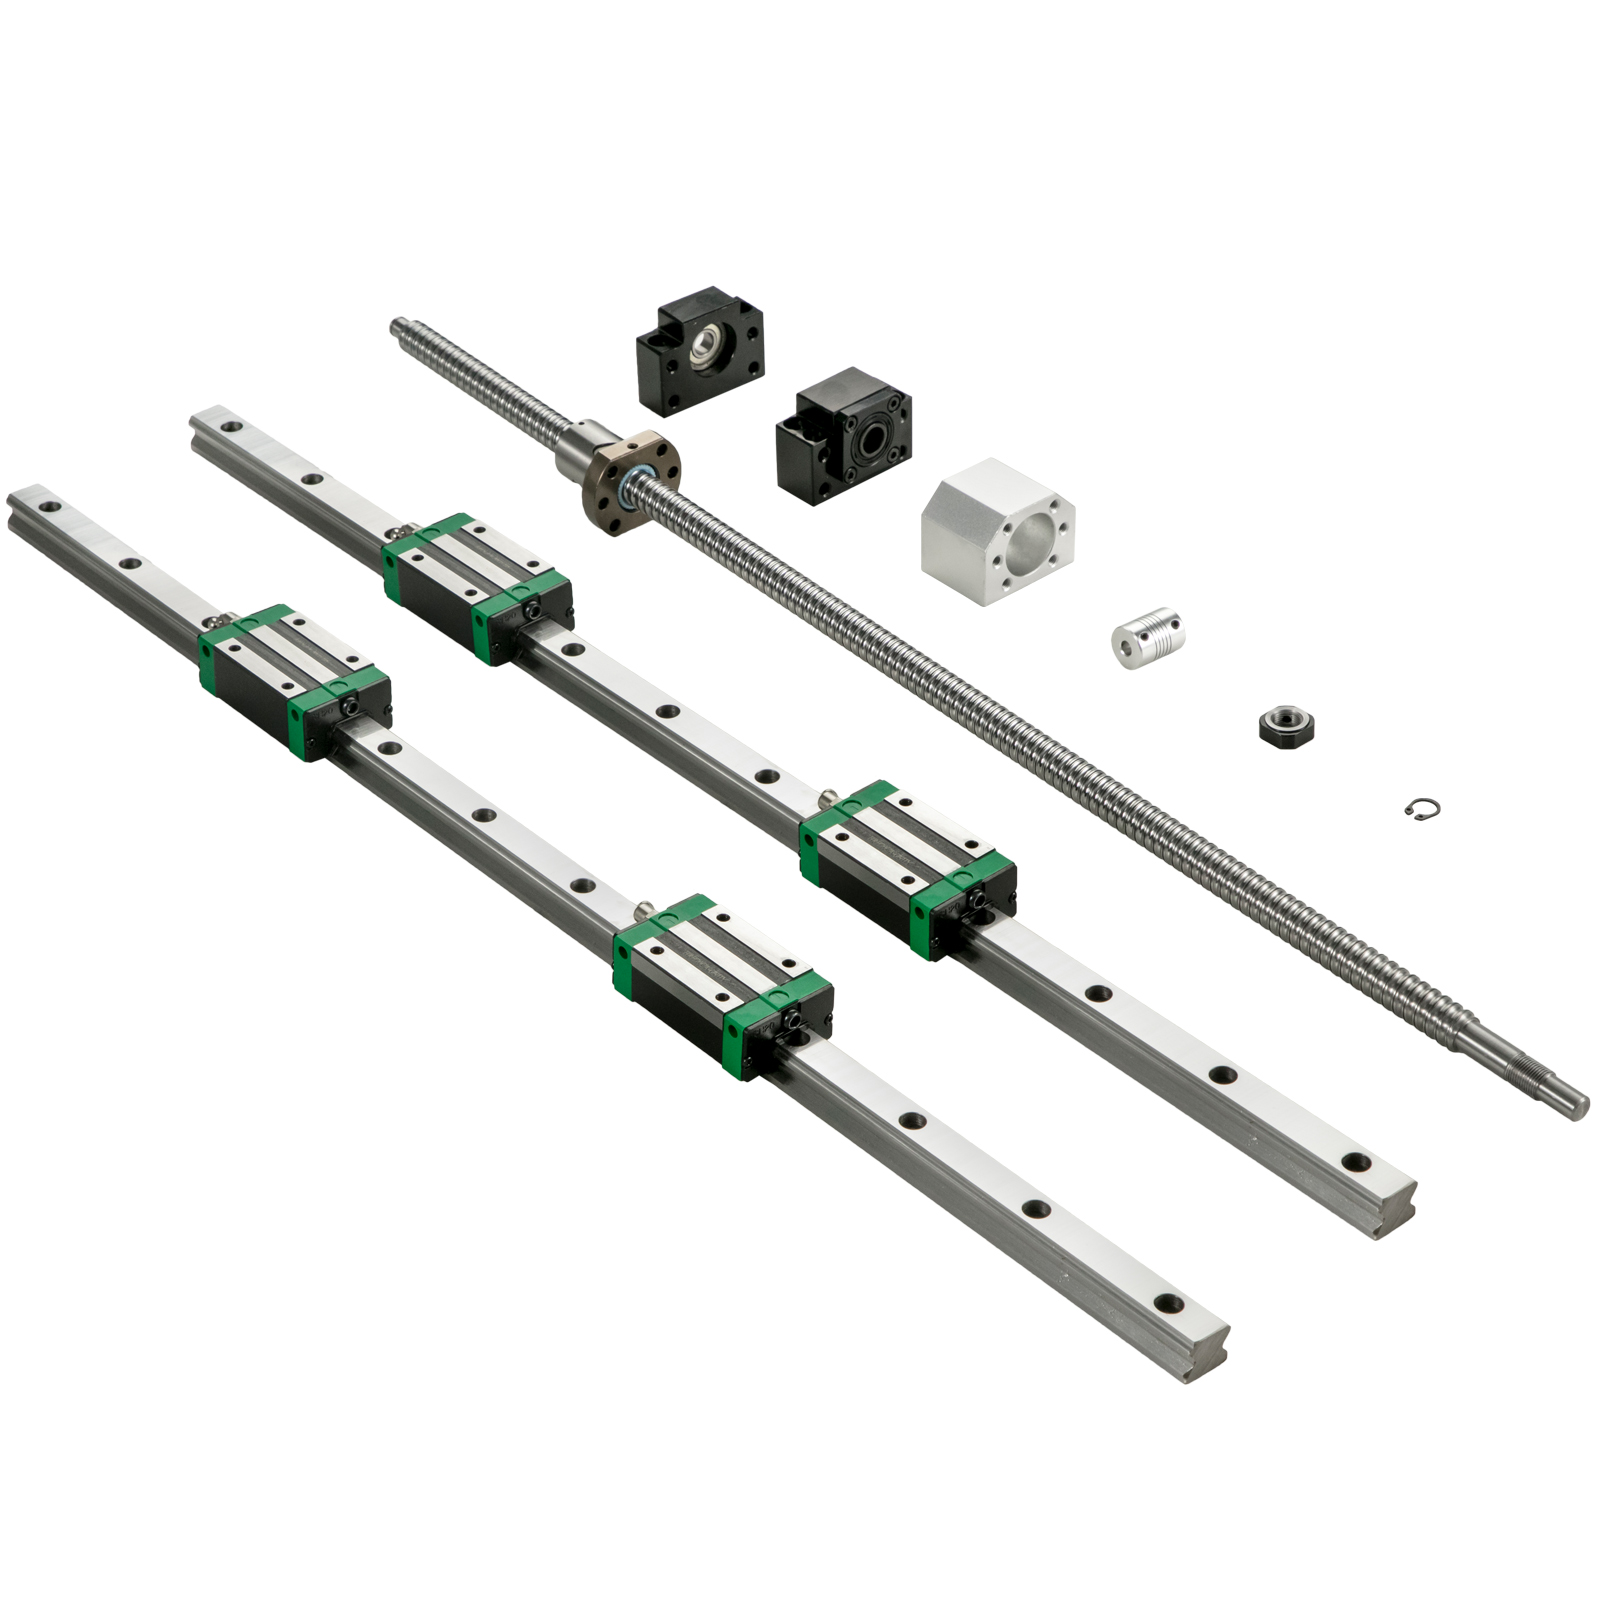 Guida-Lineare-CNC-HGR20-200mm-2-Pezzi-Blocco-di-Cuscinetti-4-Pezzi miniatura 10